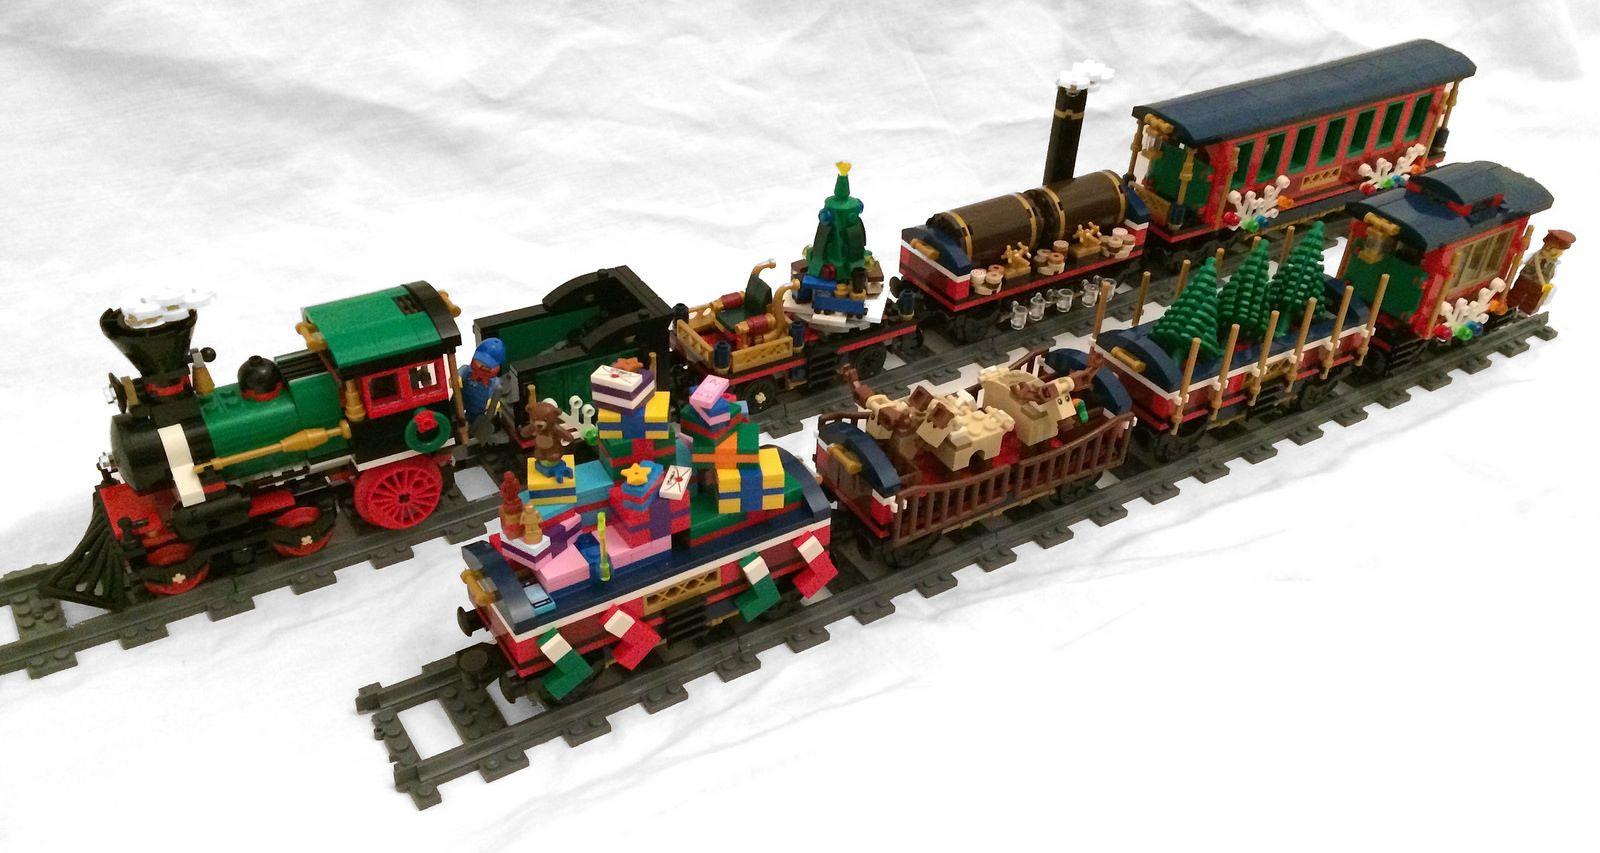 Lego Christmas Train.Lego 10254 Winter Holiday Train Custom Wagons For Winter